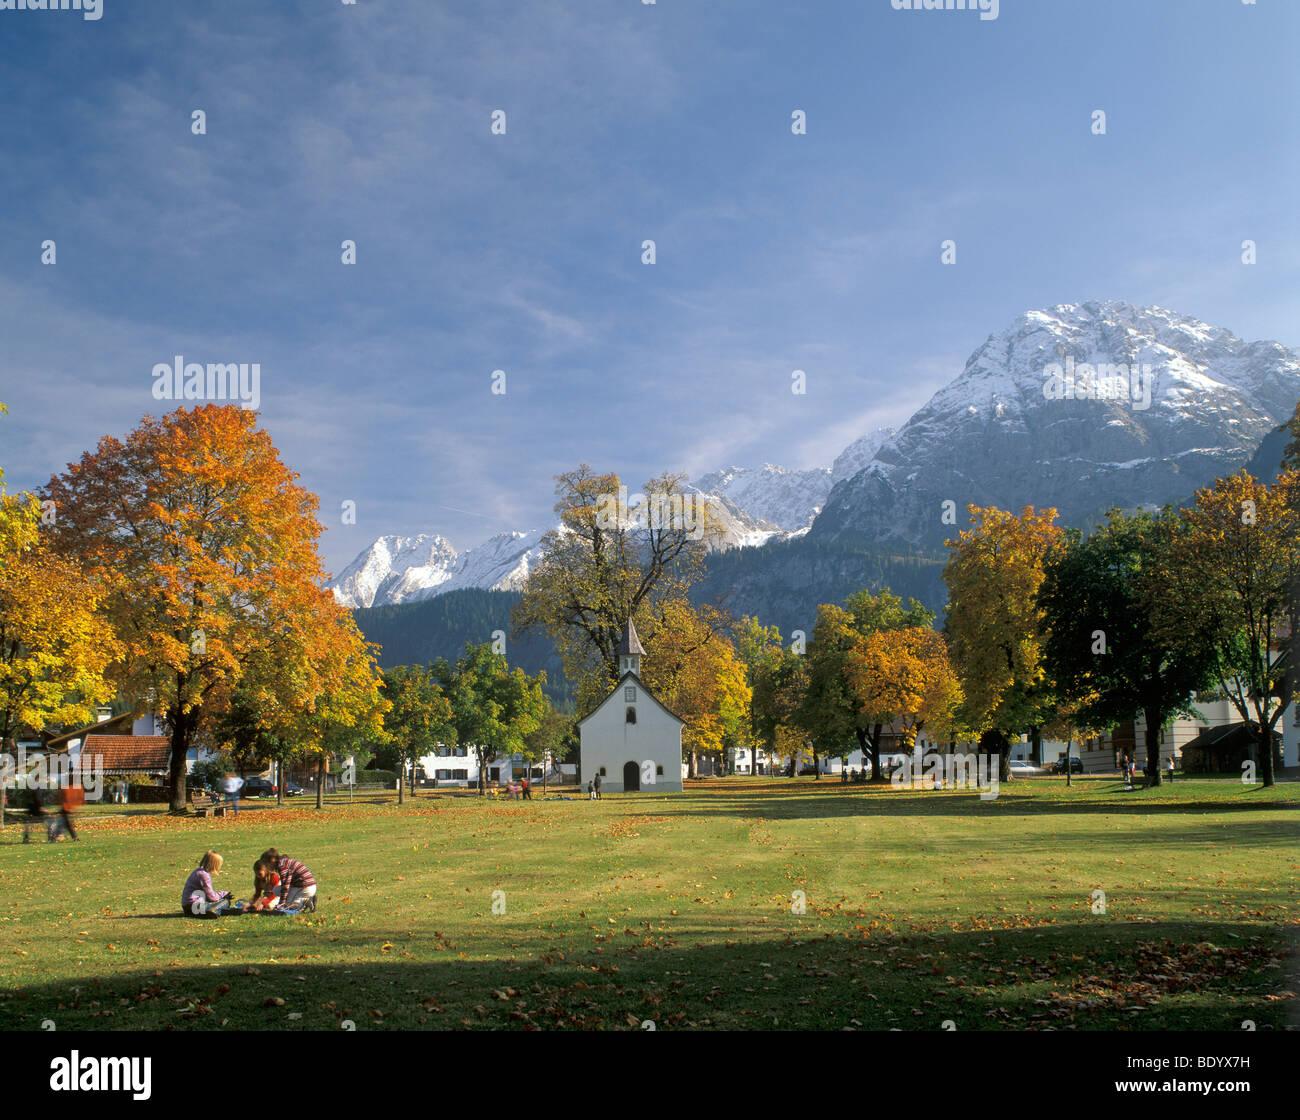 Municipality of Ehrwald, Mt. Daniel, Tyrol, Austria, Europe - Stock Image